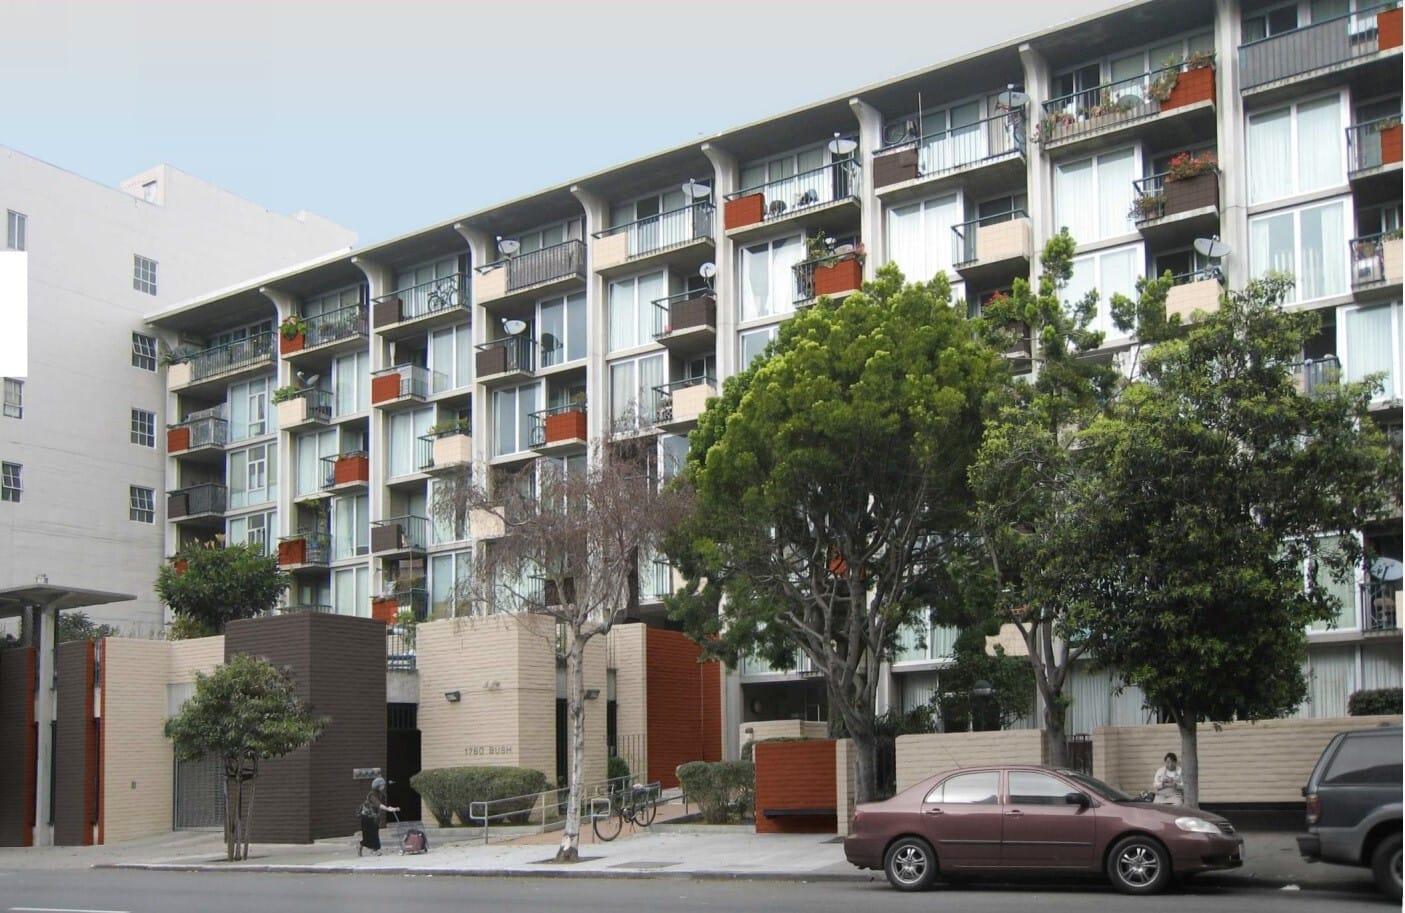 Image of 1760 Bush Apartments in San Francisco, California